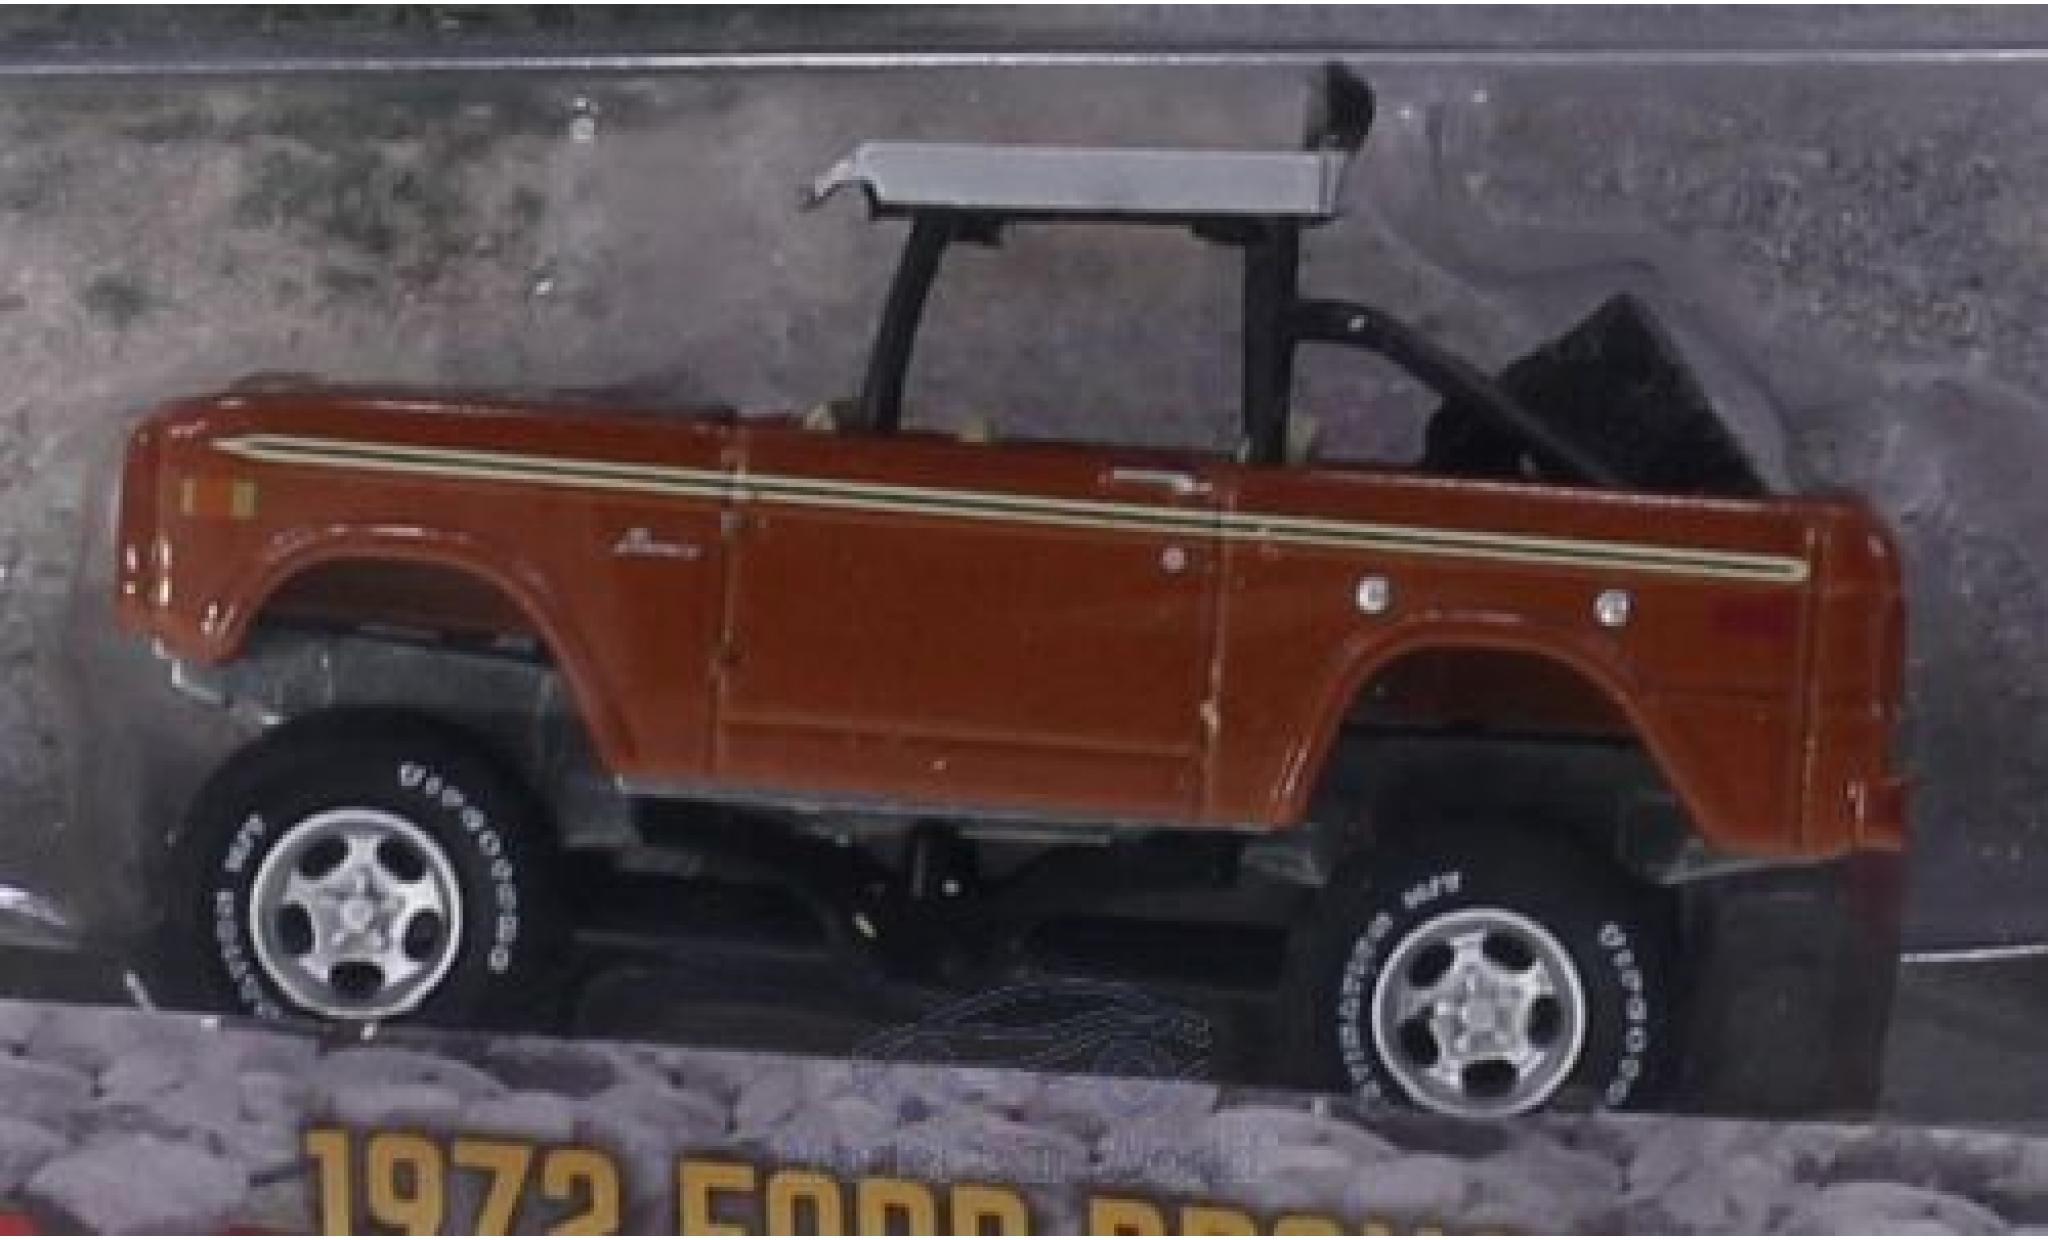 Ford Bronco 1/64 Greenlight Baja kupfer/matt-black 1972